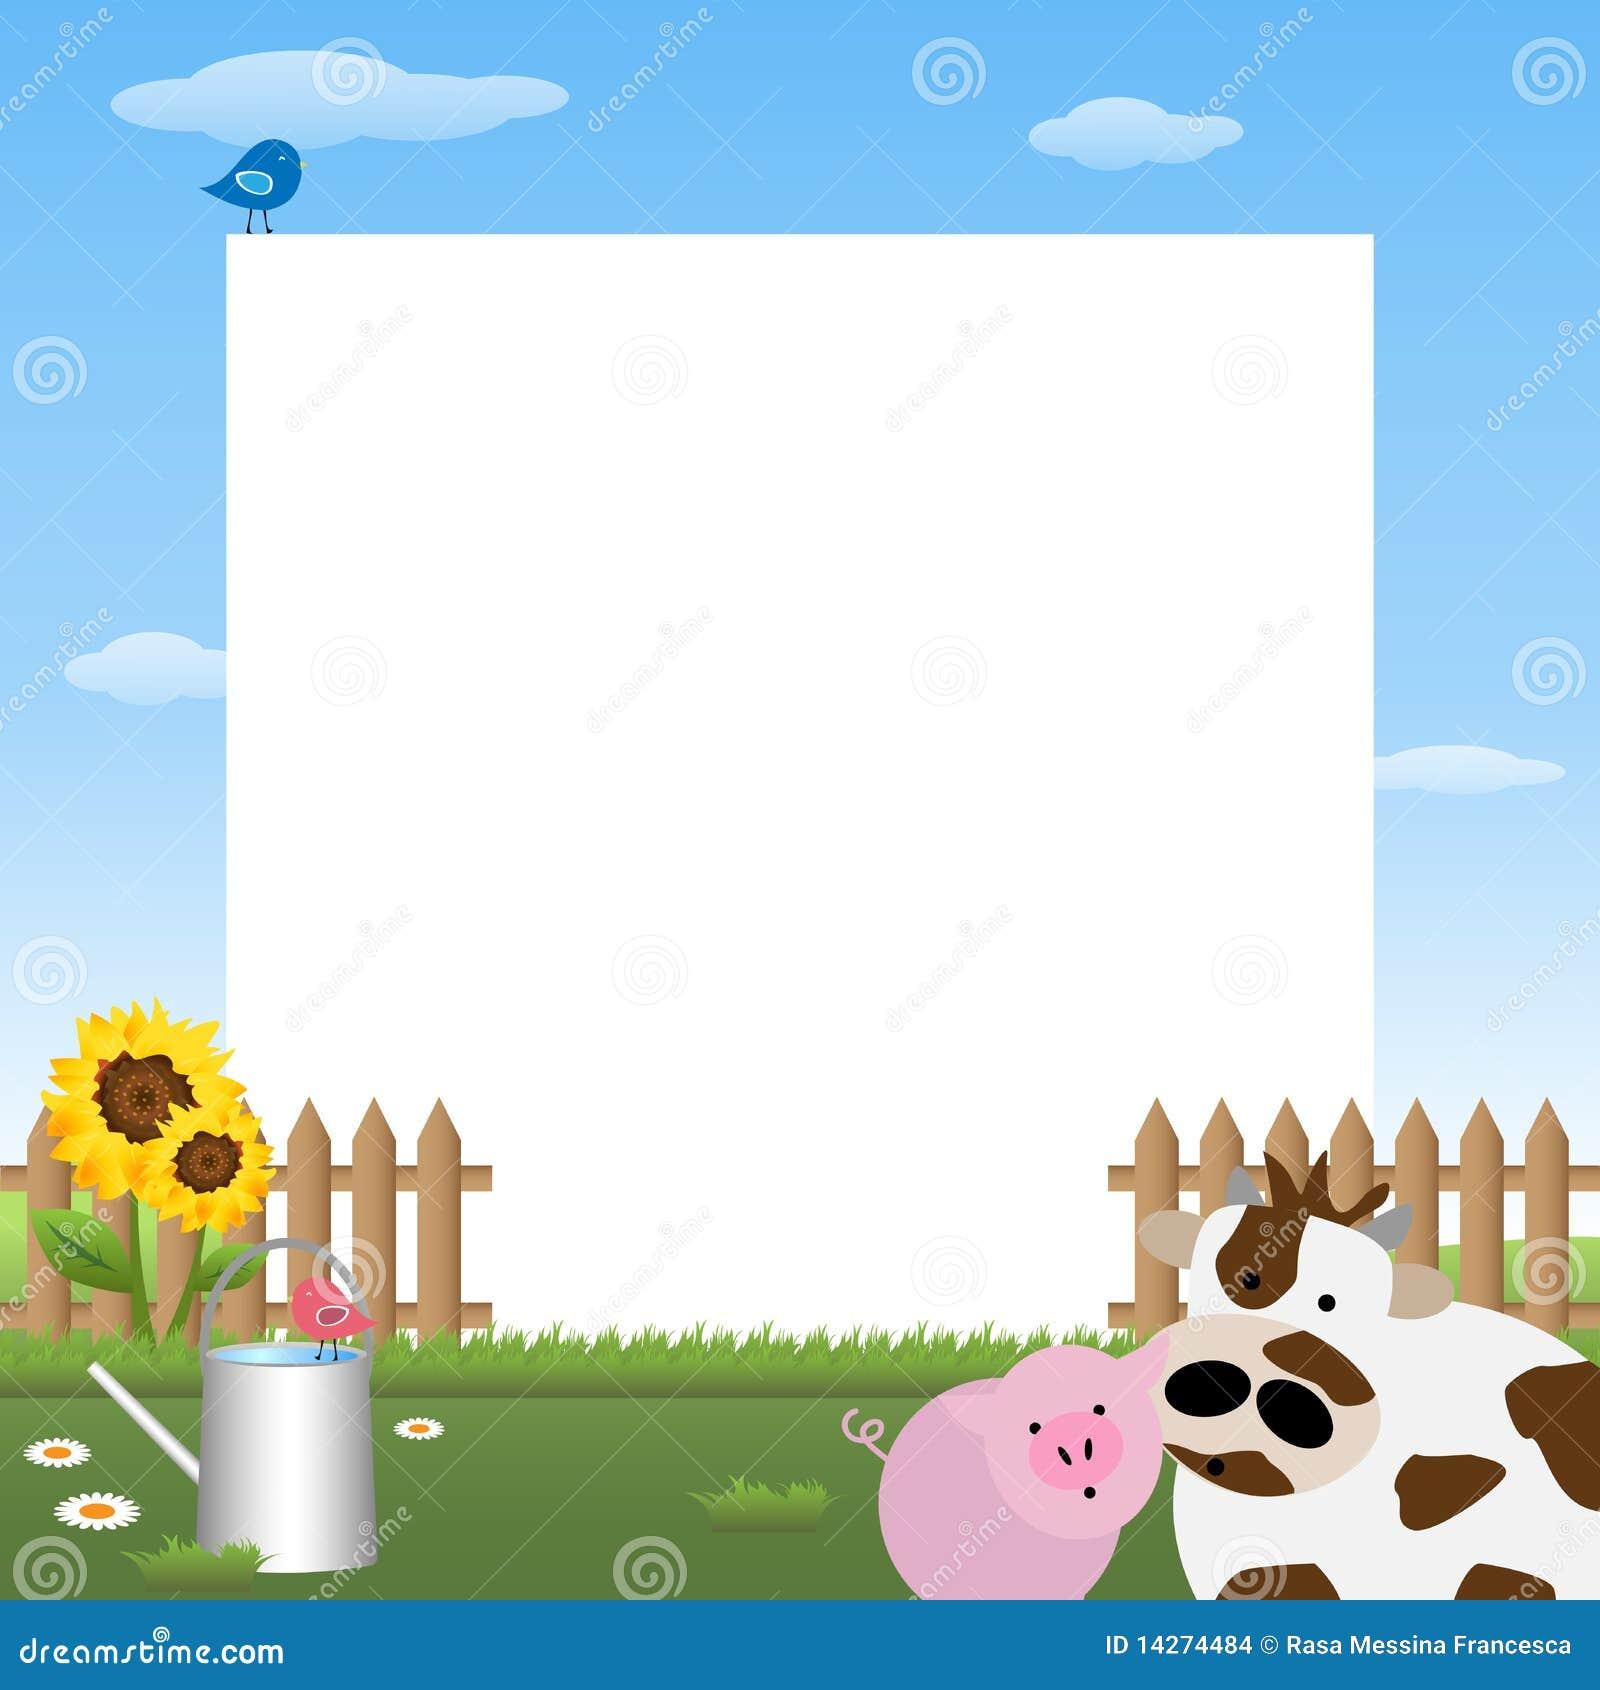 Farmyard Frame Stock Images - Image: 14274484